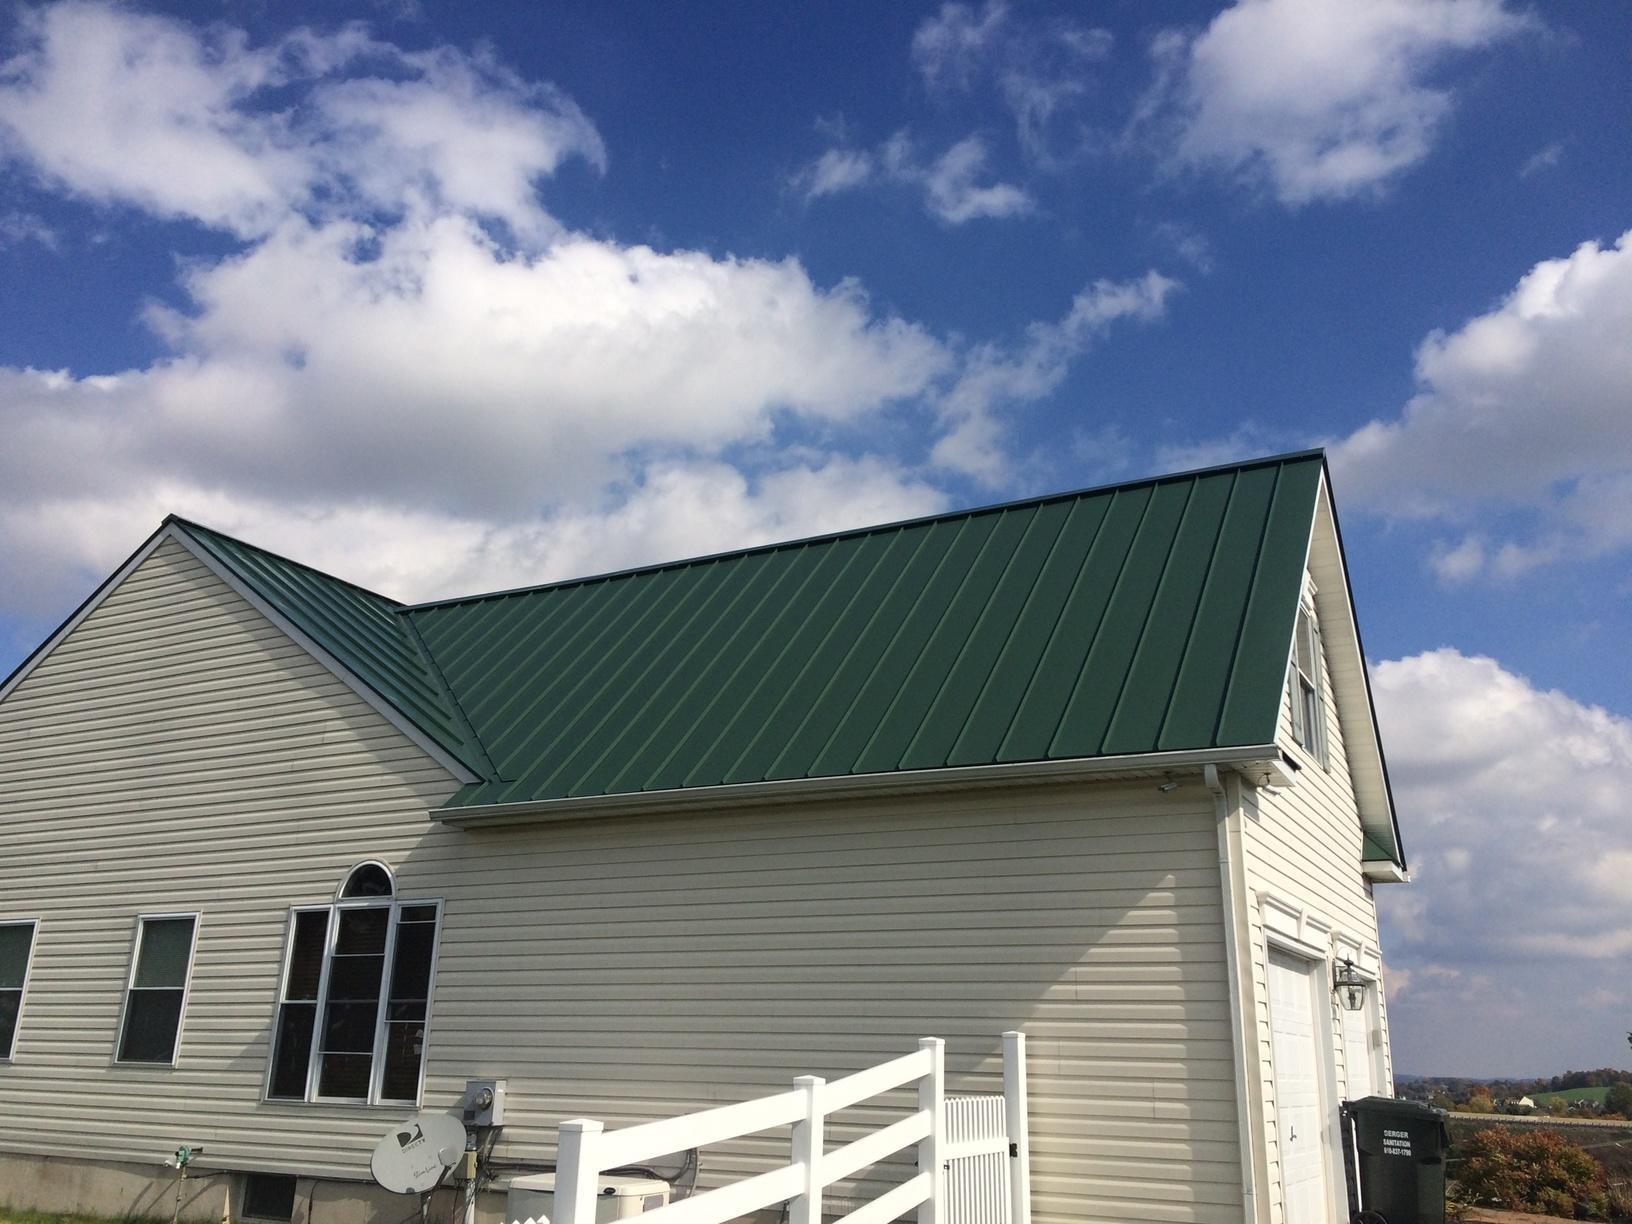 Stockton, NJ Metal Roof Replacement